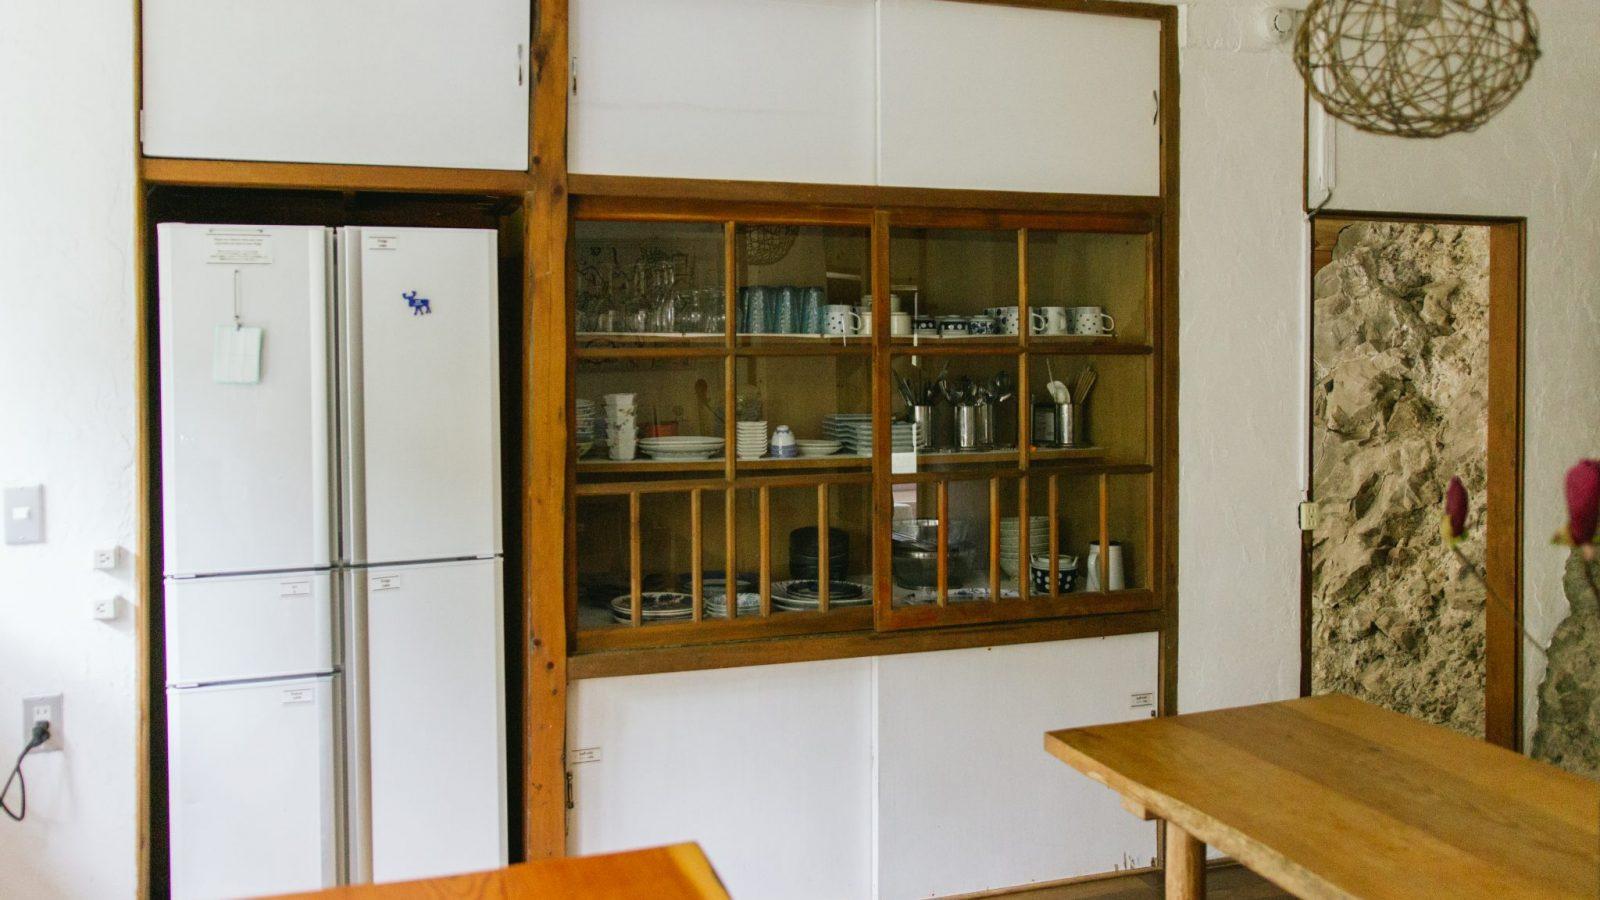 Communal kitchen at Retreat wabi-sabi Kisami Shimoda